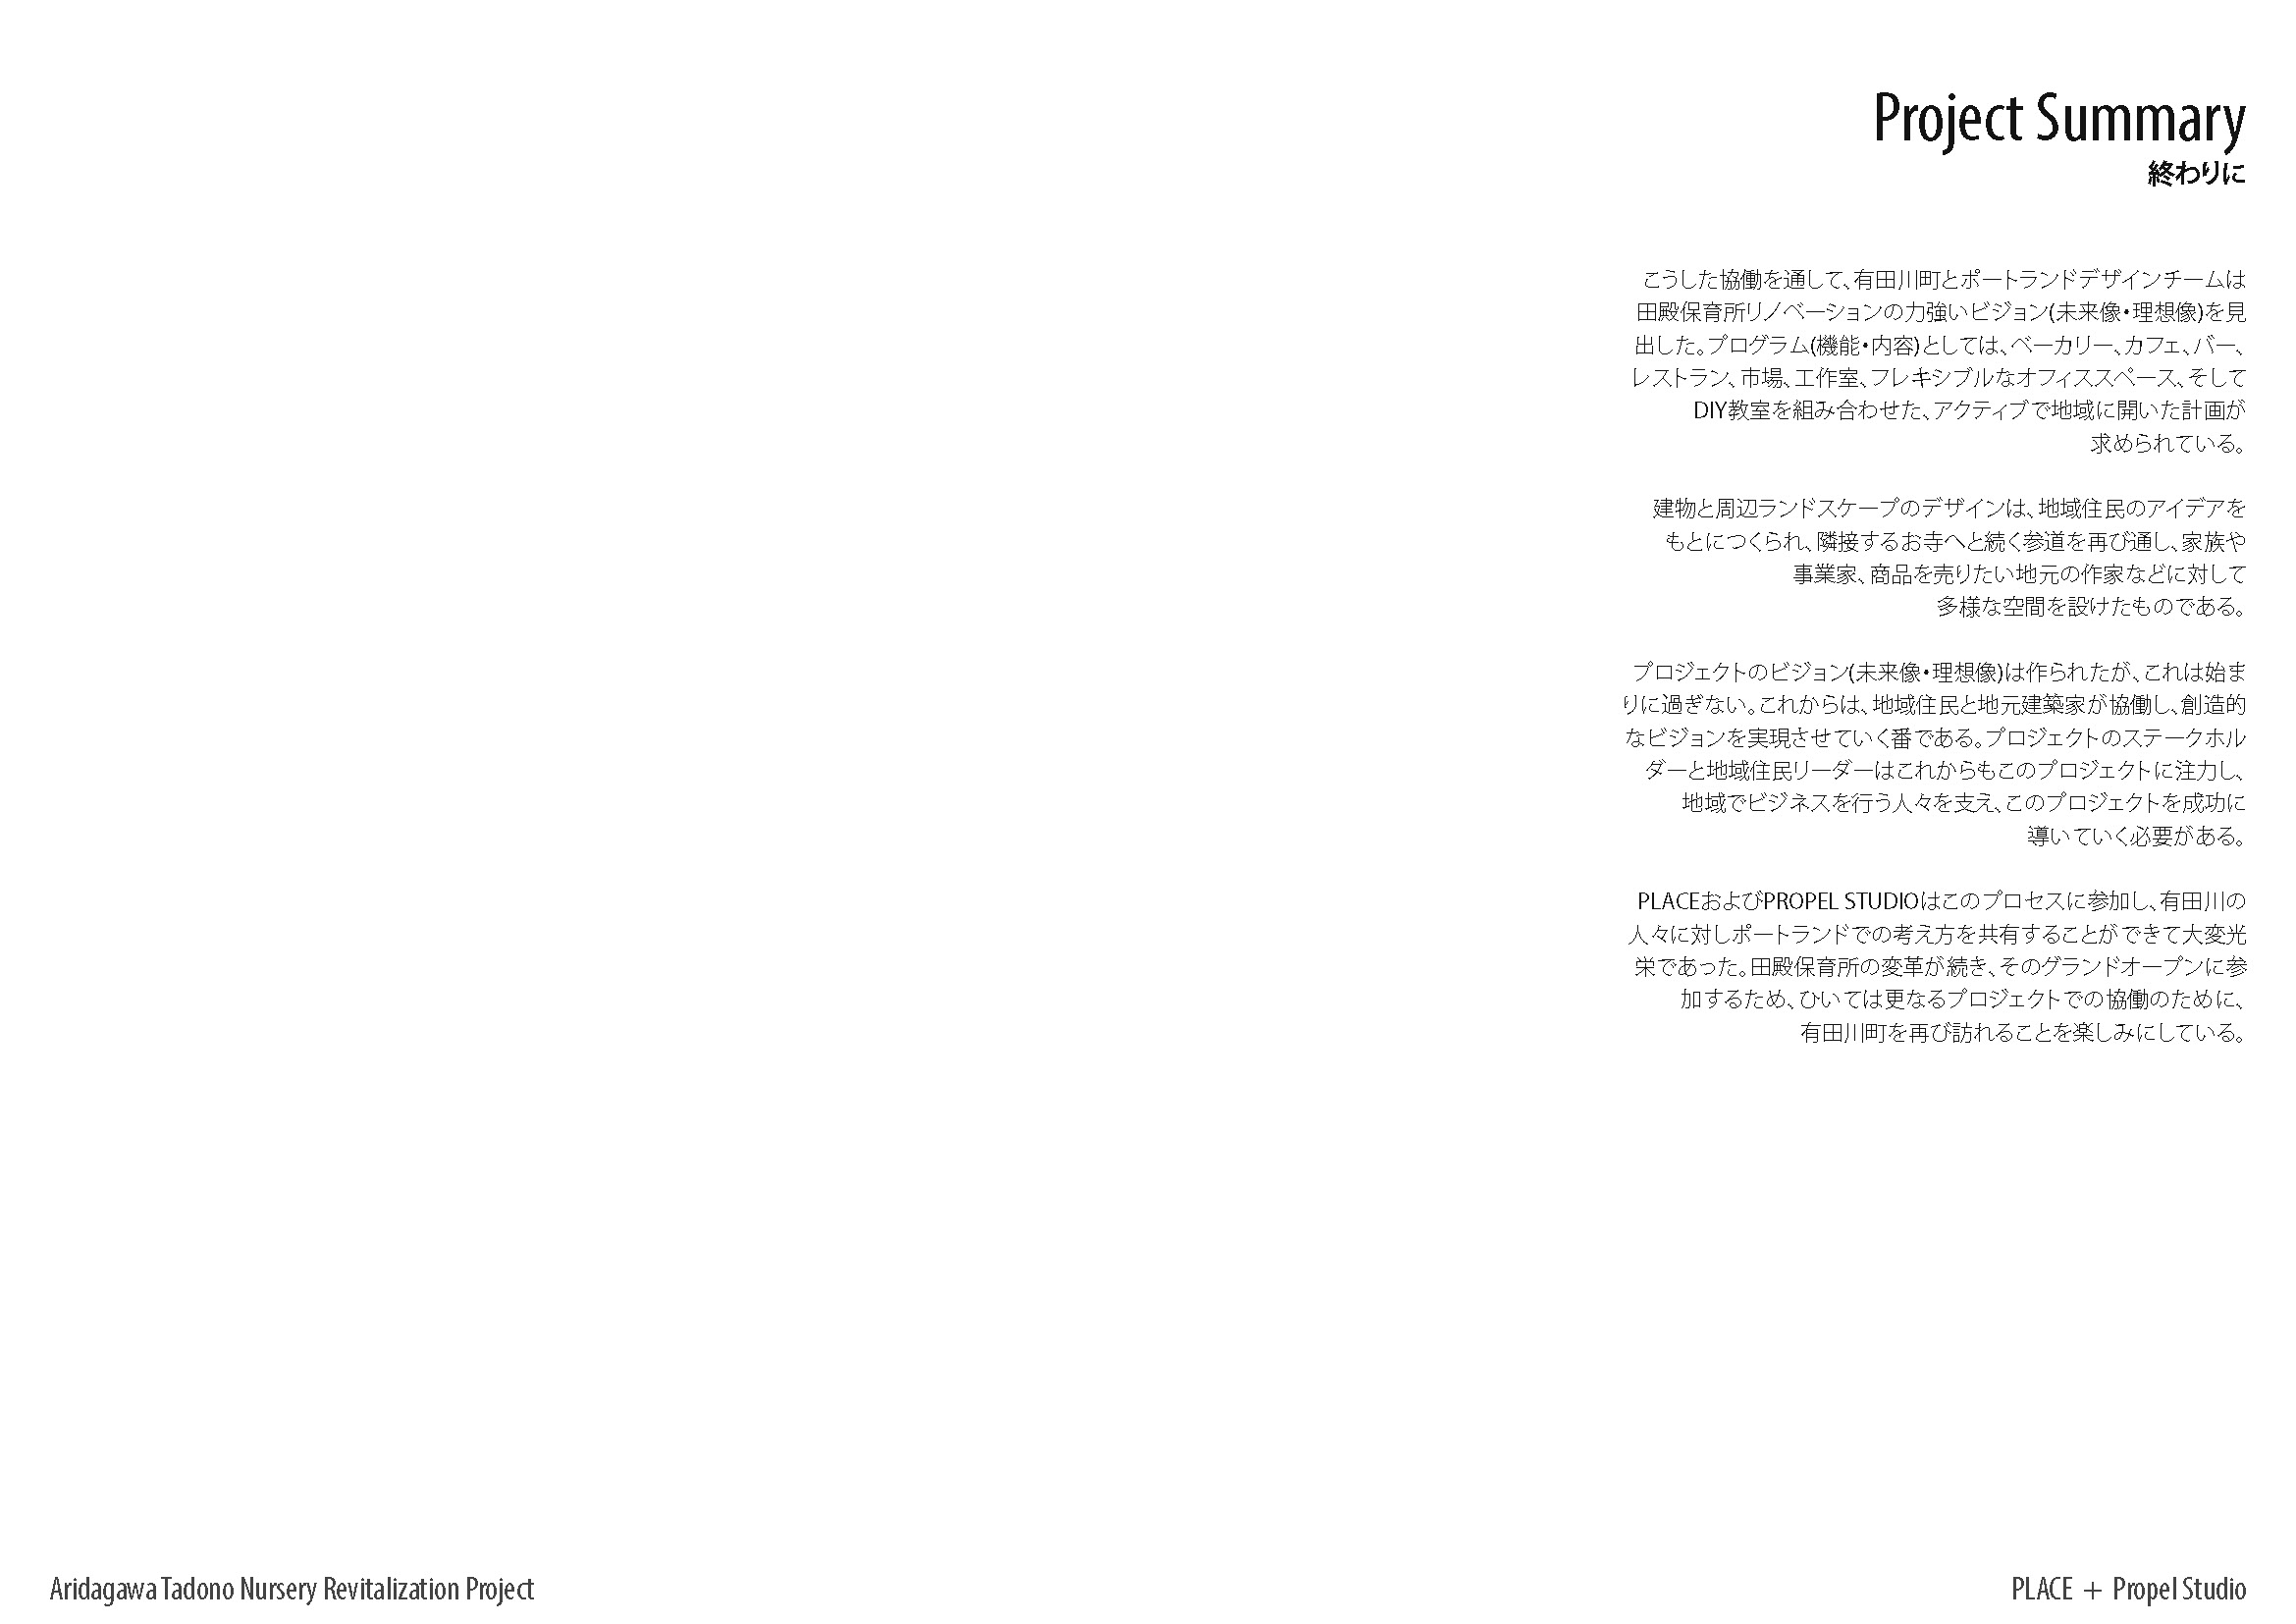 2016.06.30_Aridagawa Summary_Page_12.jpg